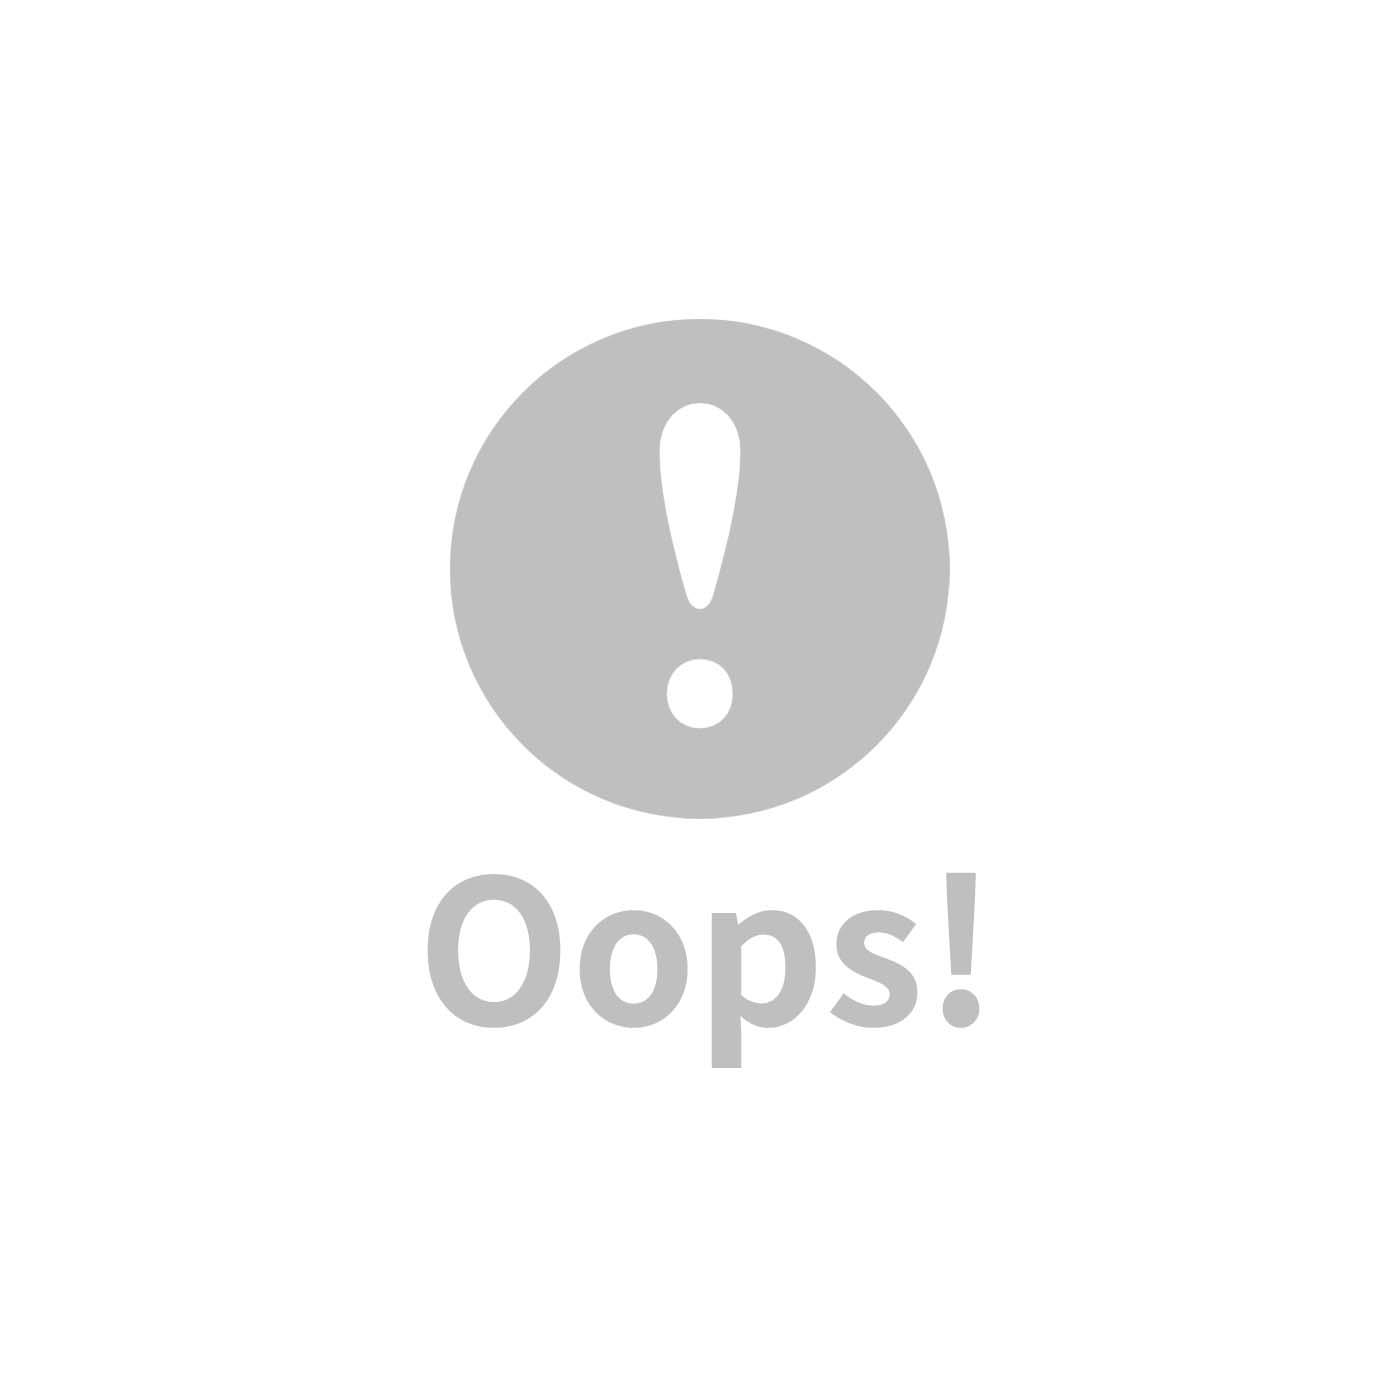 La Millou送禮套組(竹纖涼感防踢背心70cm(分腿扣)+竹纖涼感小童枕)-贈送禮提袋